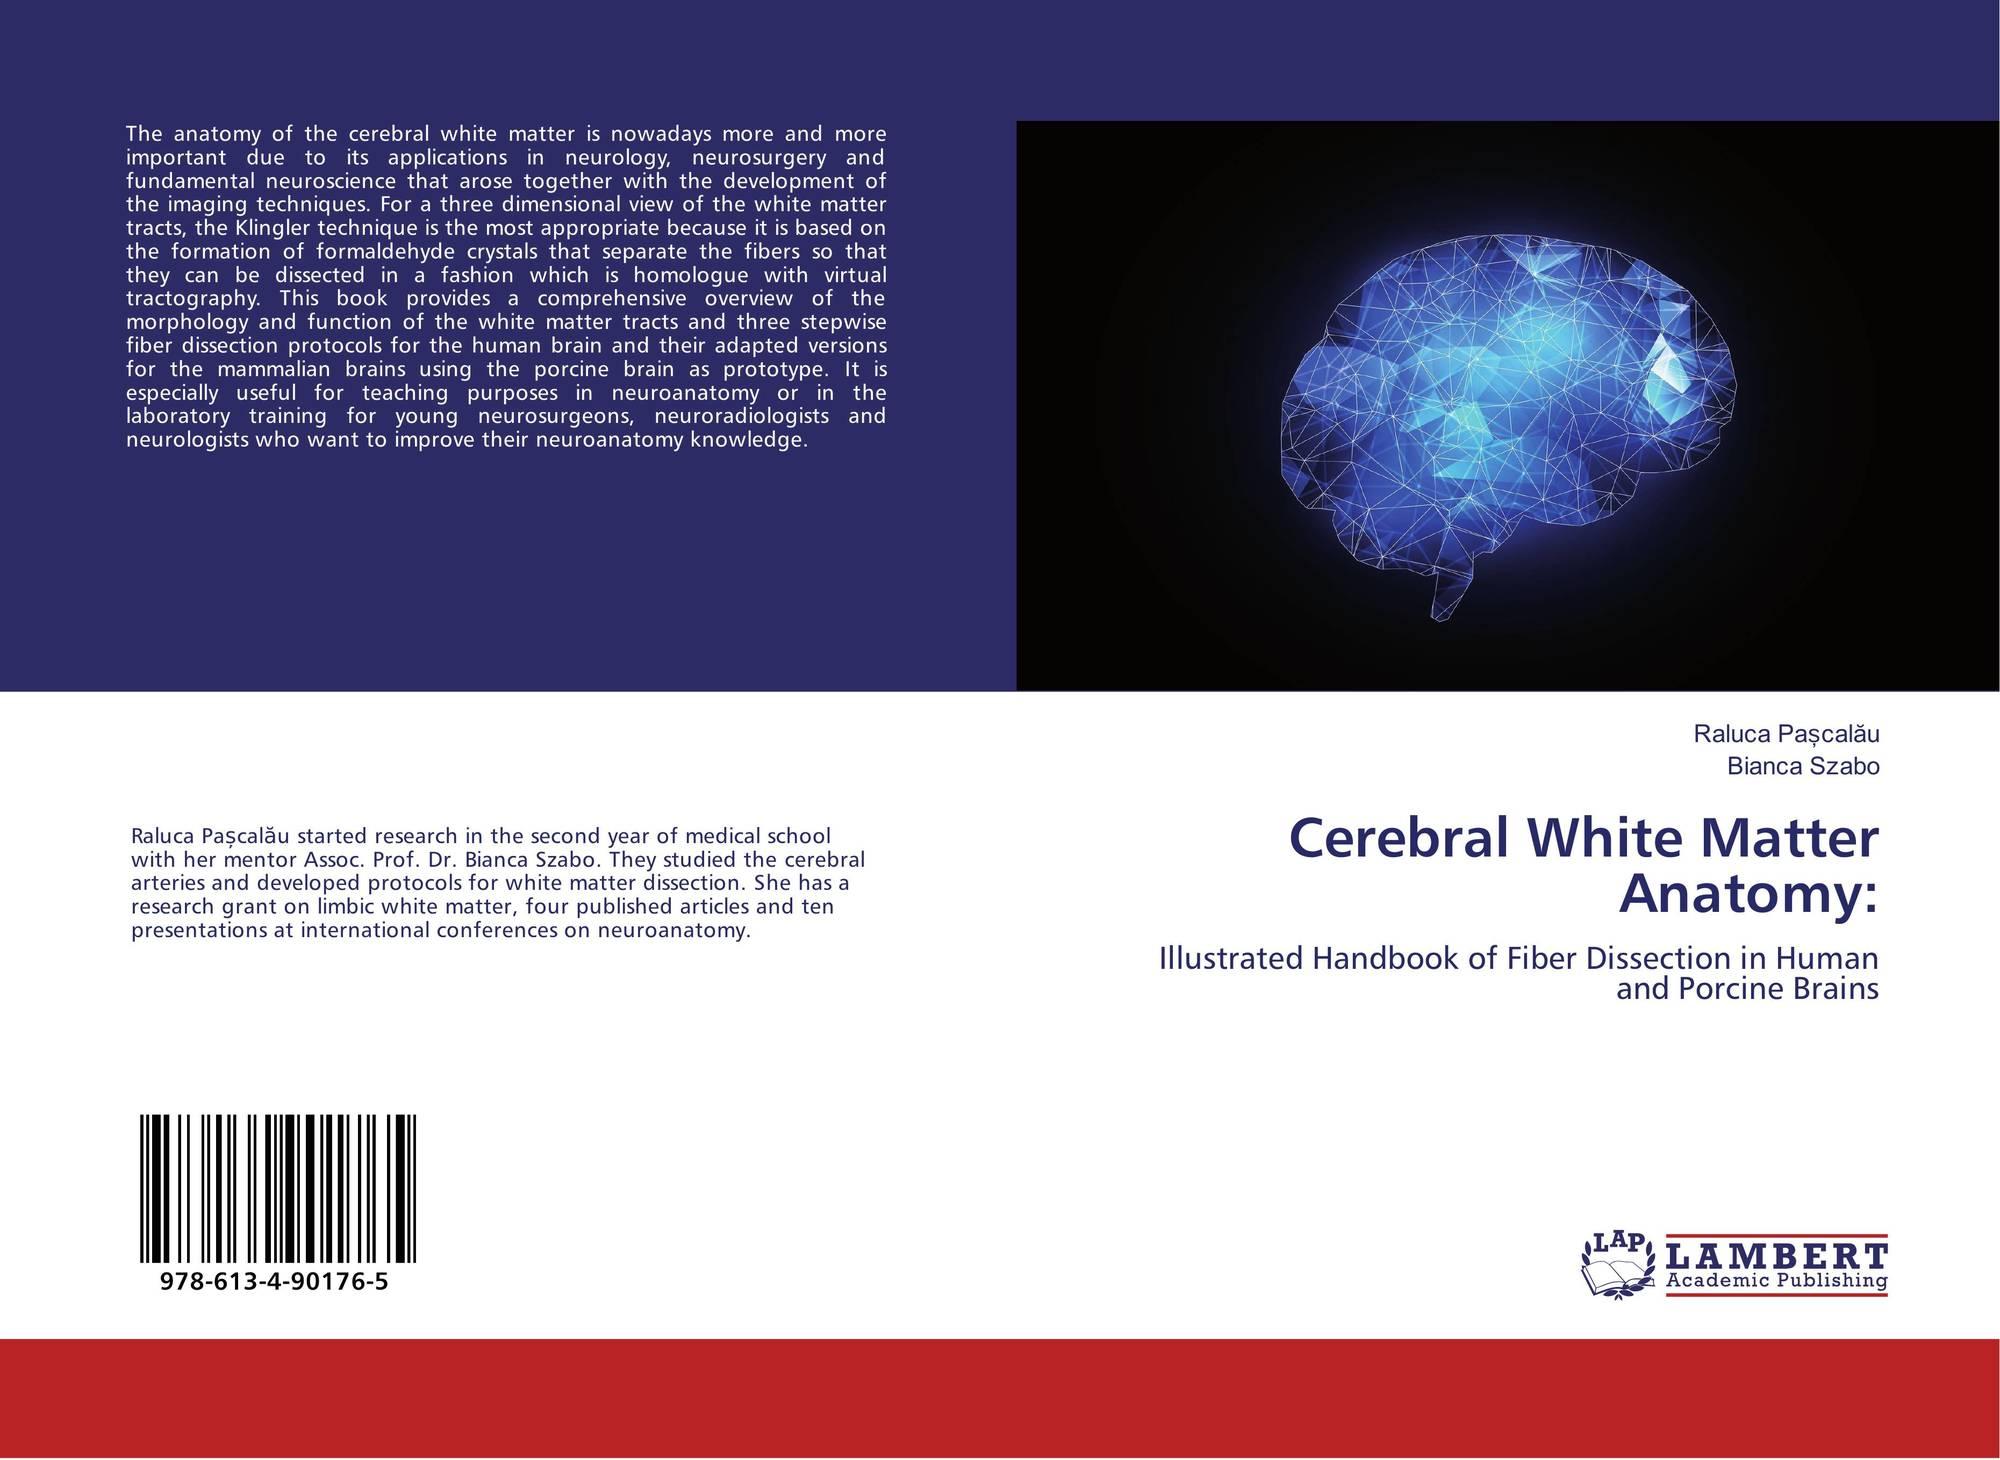 Cerebral White Matter Anatomy:, 978-613-4-90176-5, 6134901768 ...